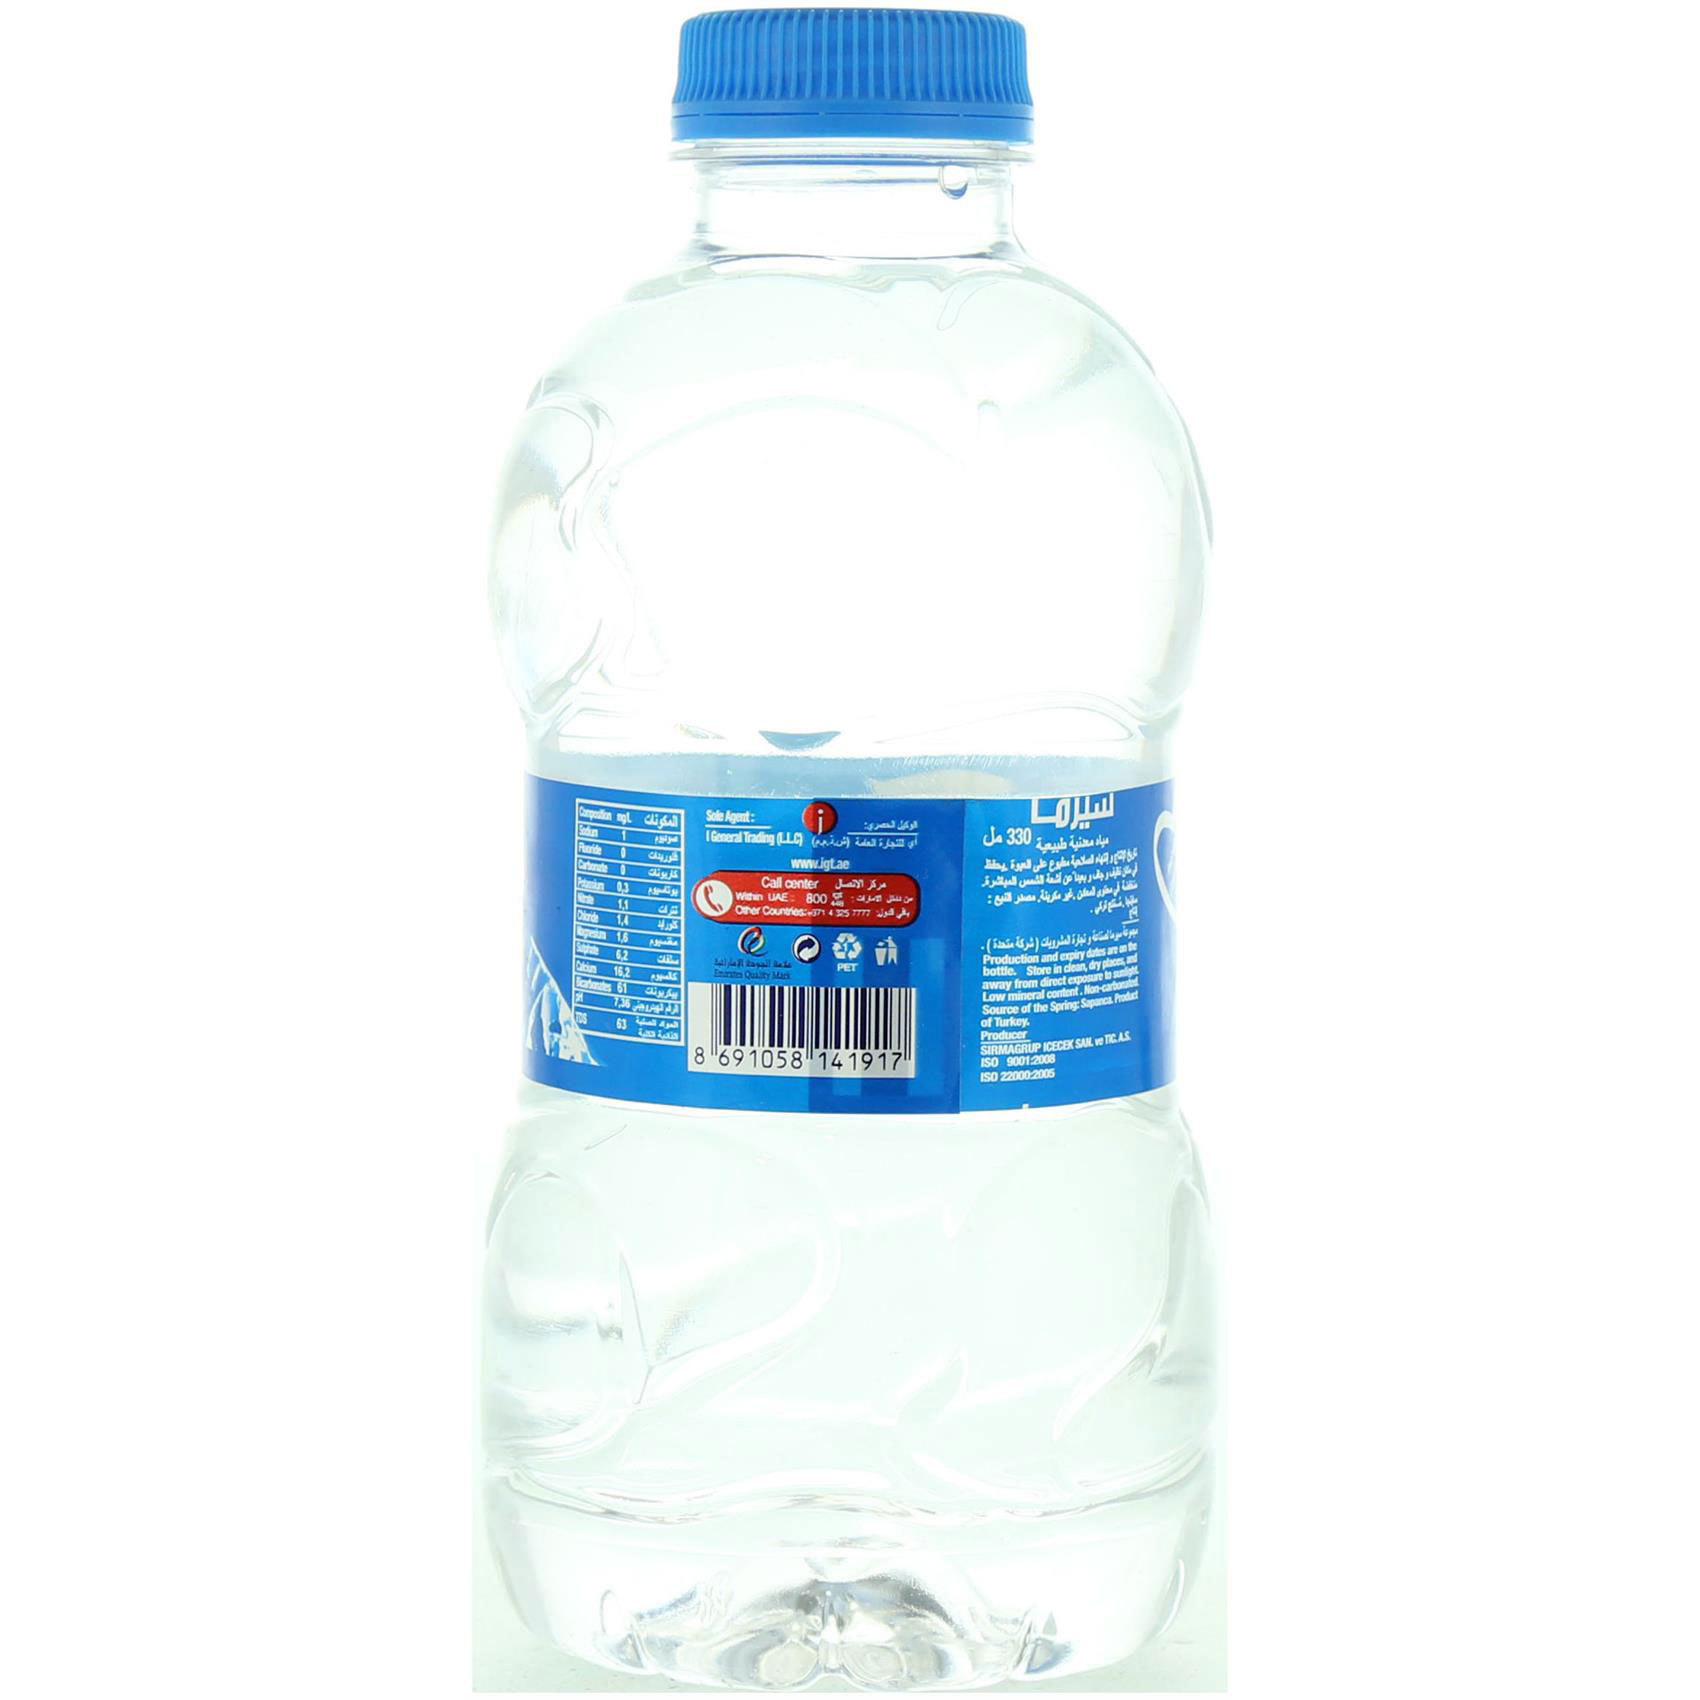 SIRMA SPRING WATER 330ML